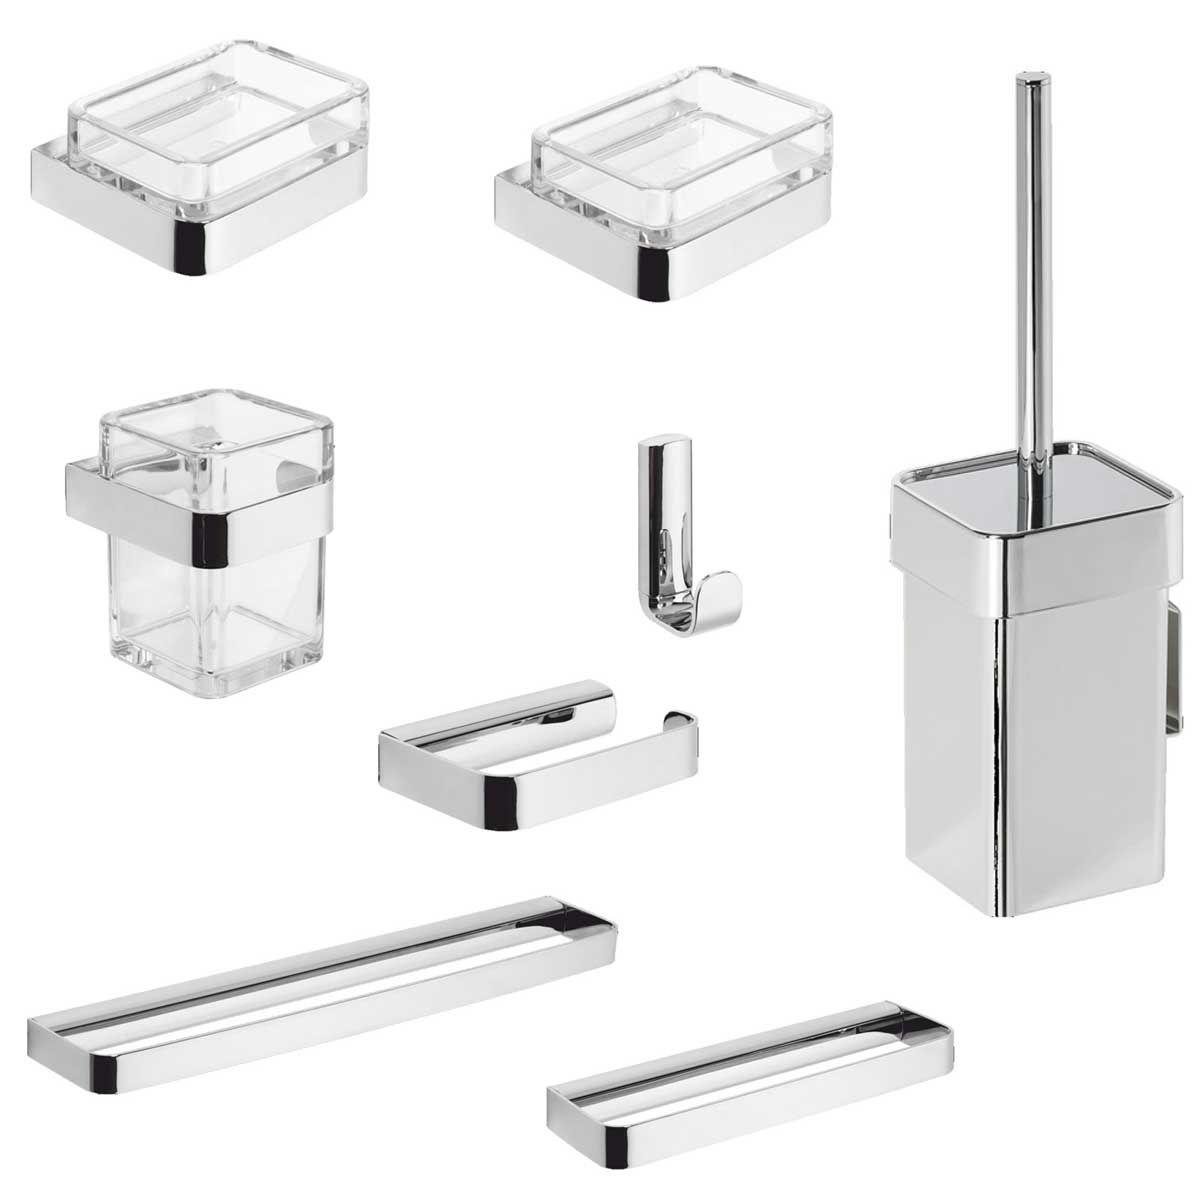 Accessori Bagno Metaform : Kit accessori bagno pezzi metaform